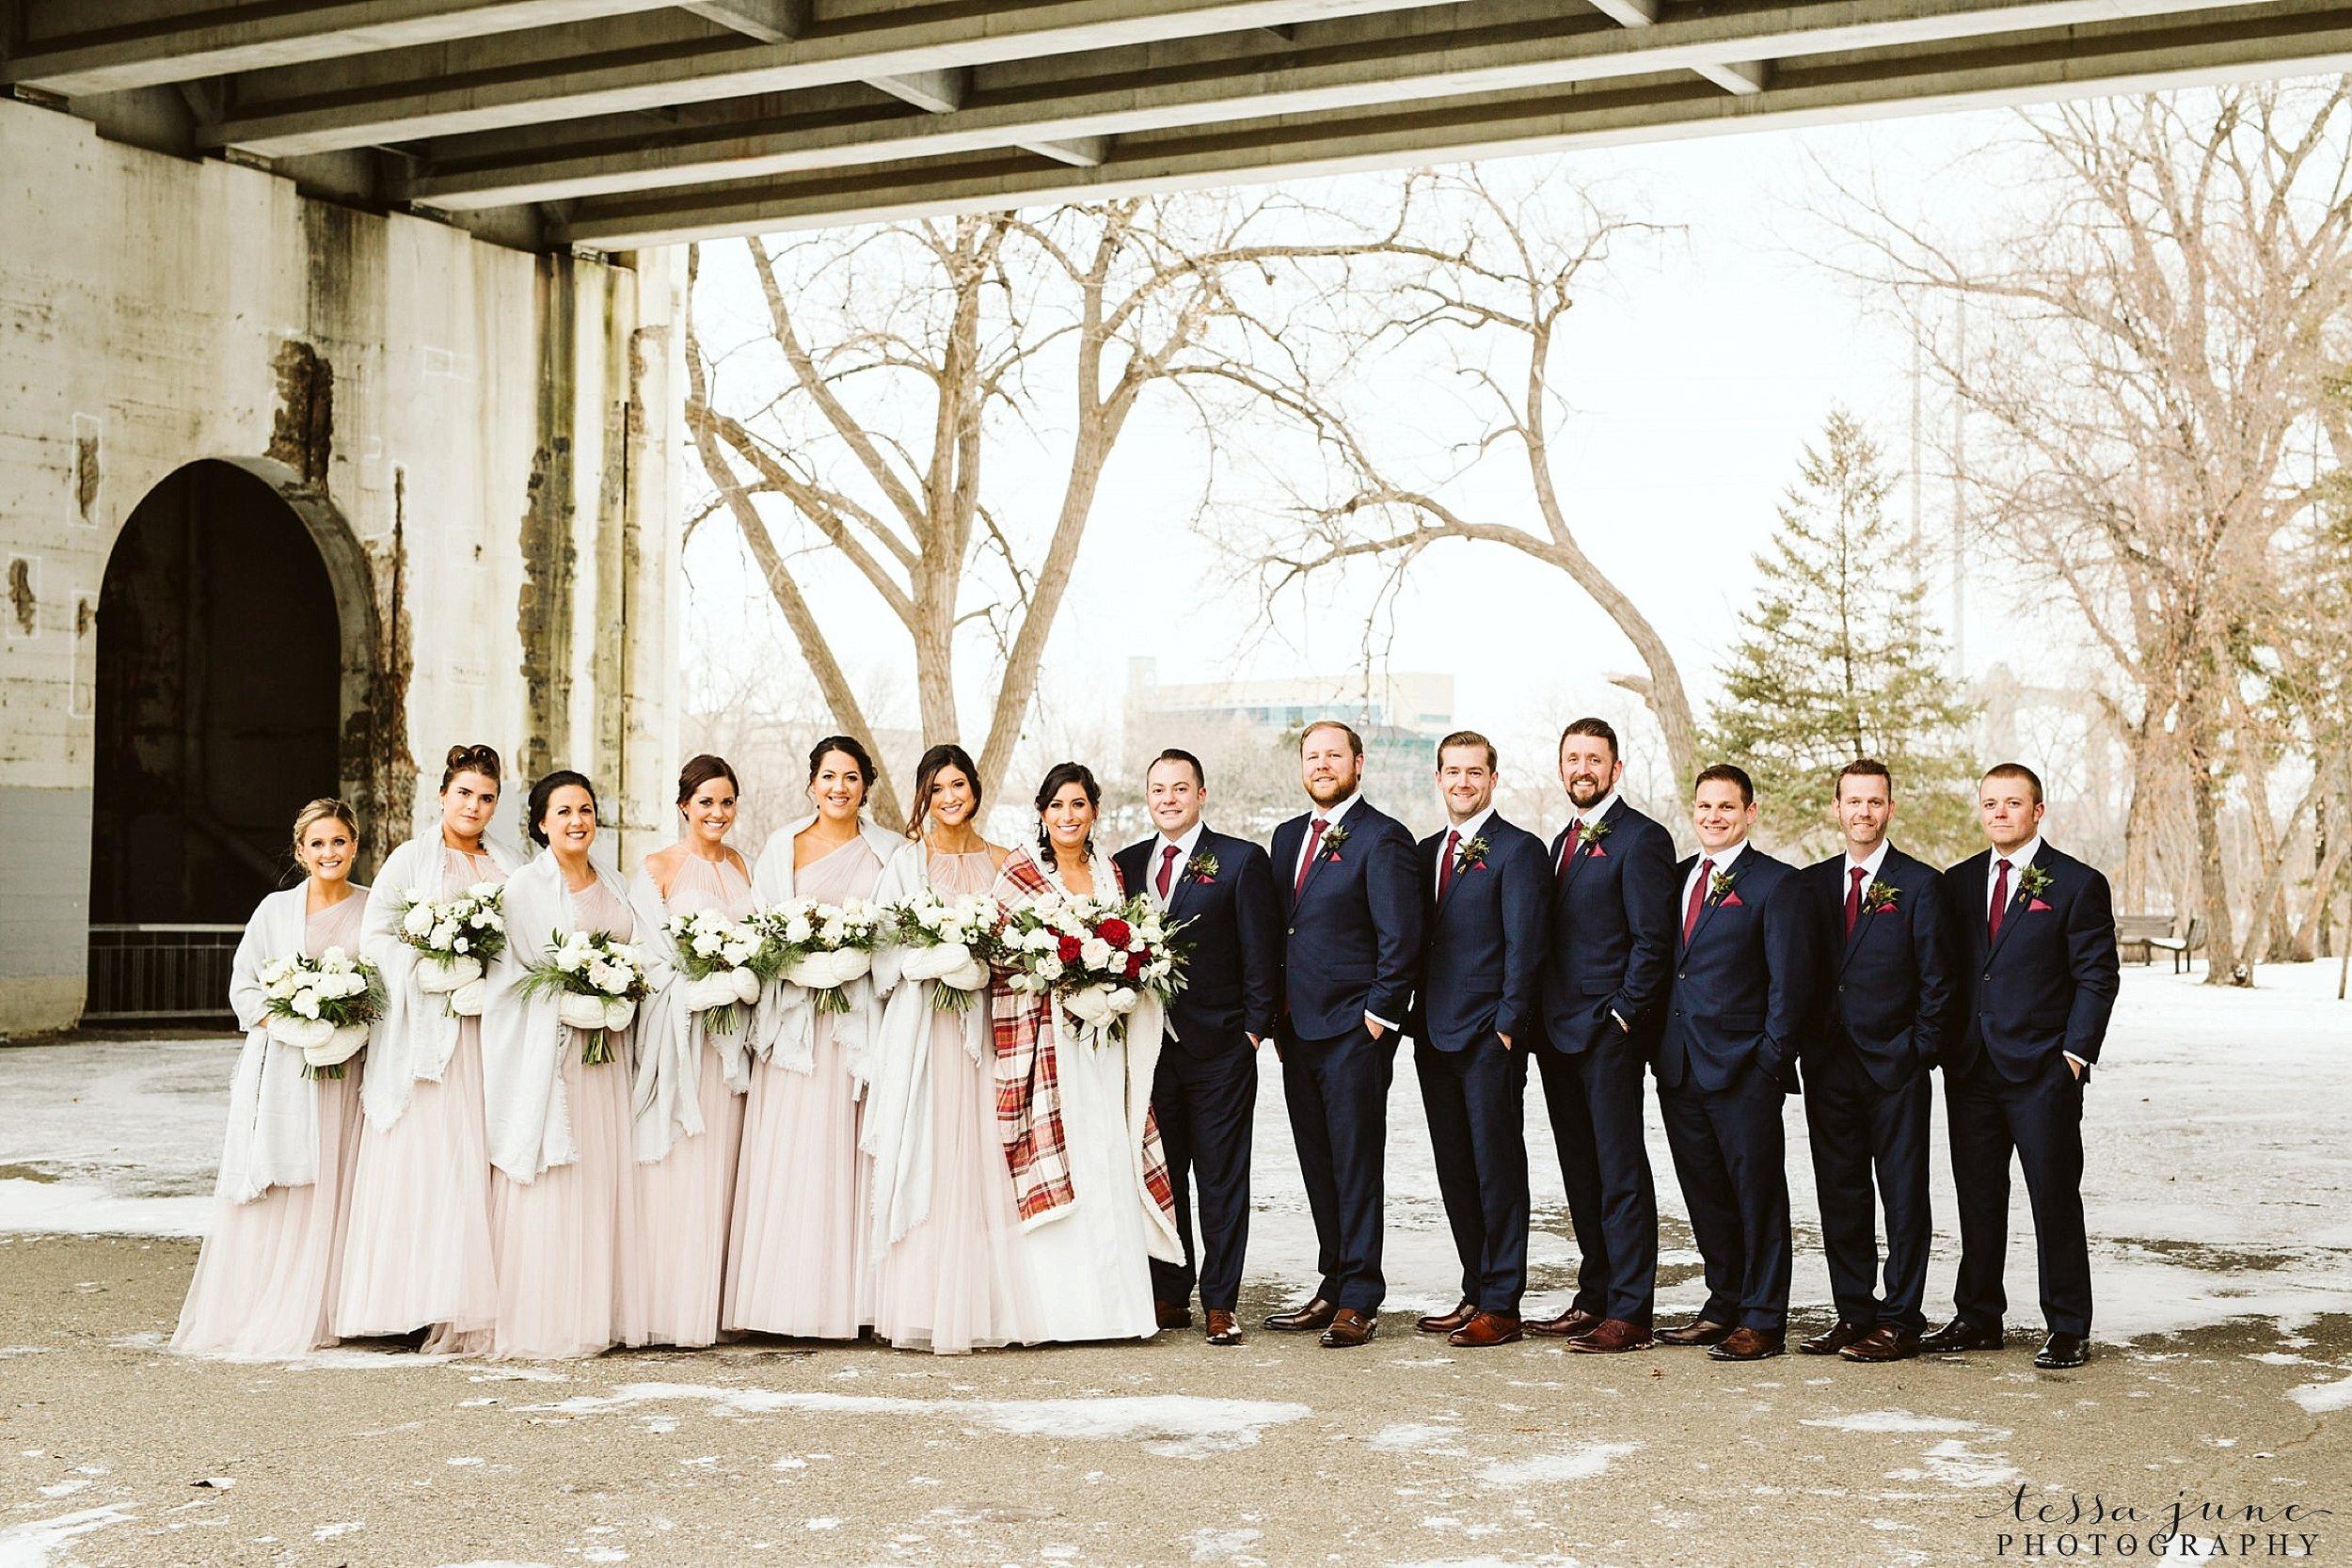 minneapolis-event-center-winter-romantic-snow-wedding-december-120.jpg